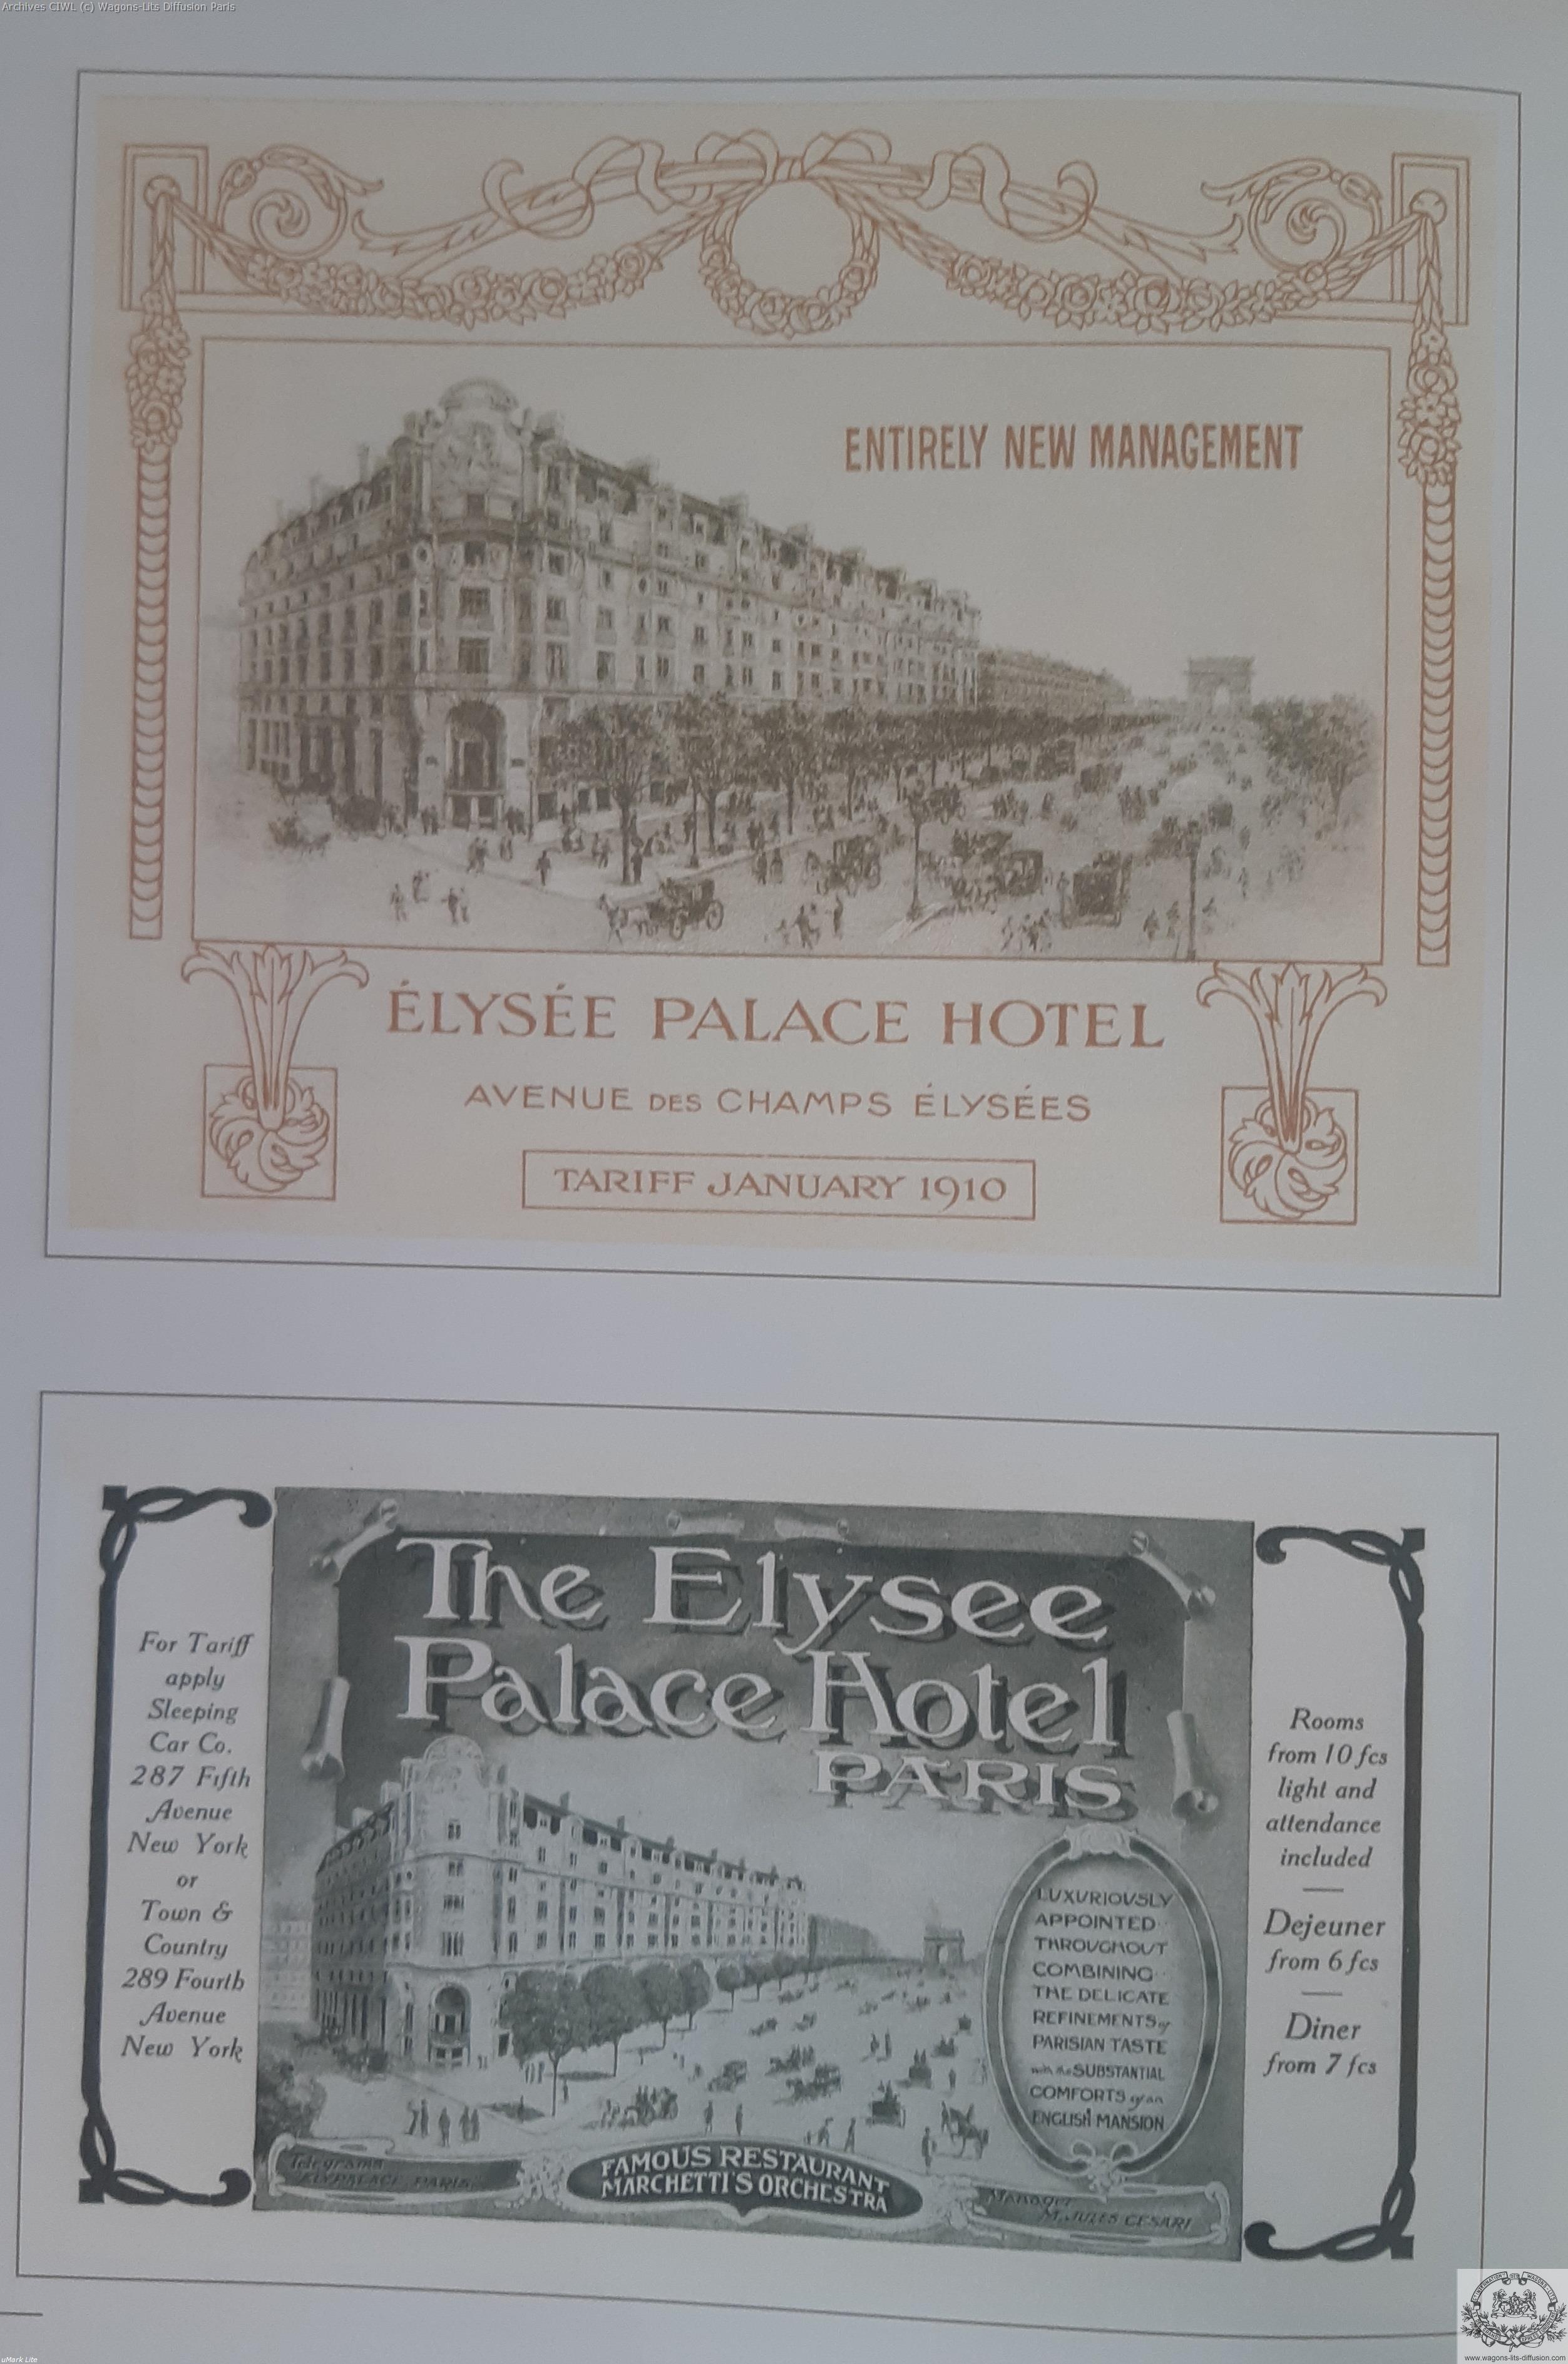 Wl elysees palace hotel paris 1900 pub 3